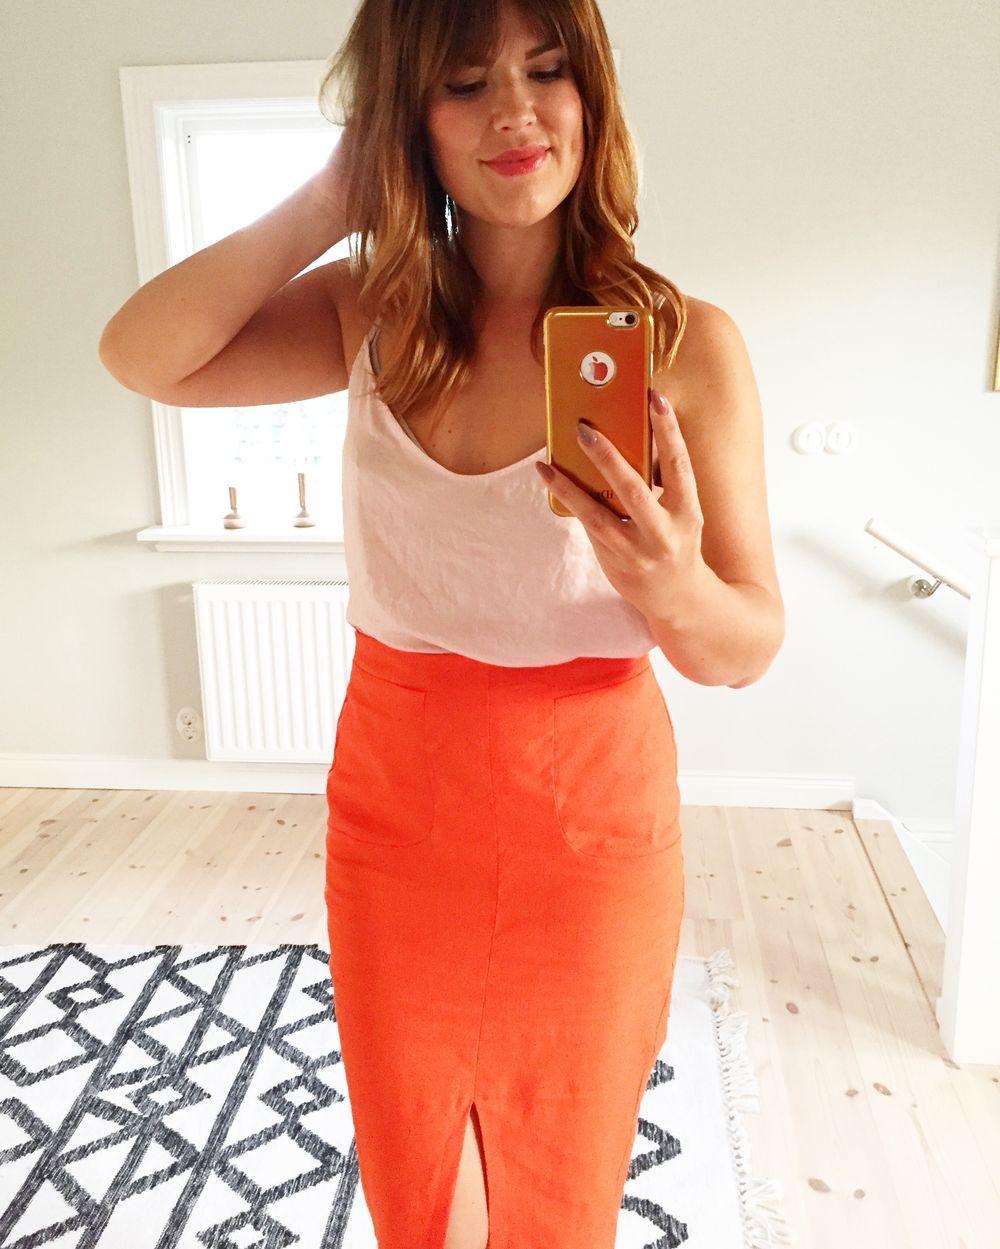 f785a0f82821 Colorelle modeblogg -   Kläder   Outfits, Fashion och Skirts